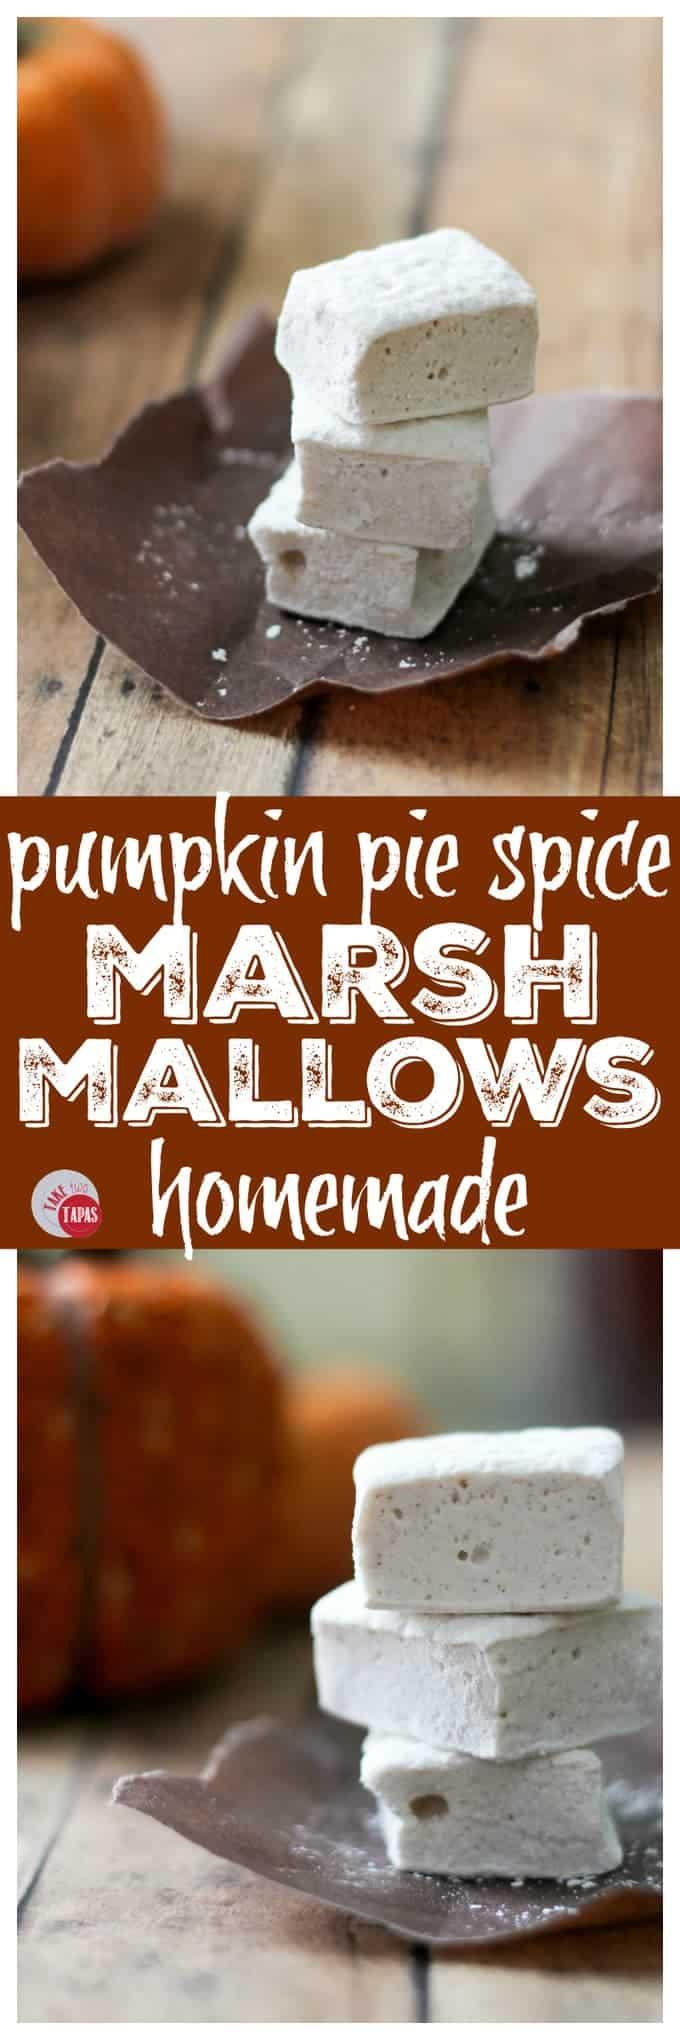 Homemade Pumpkin Pie Spice Marshmallows | Take Two Tapas